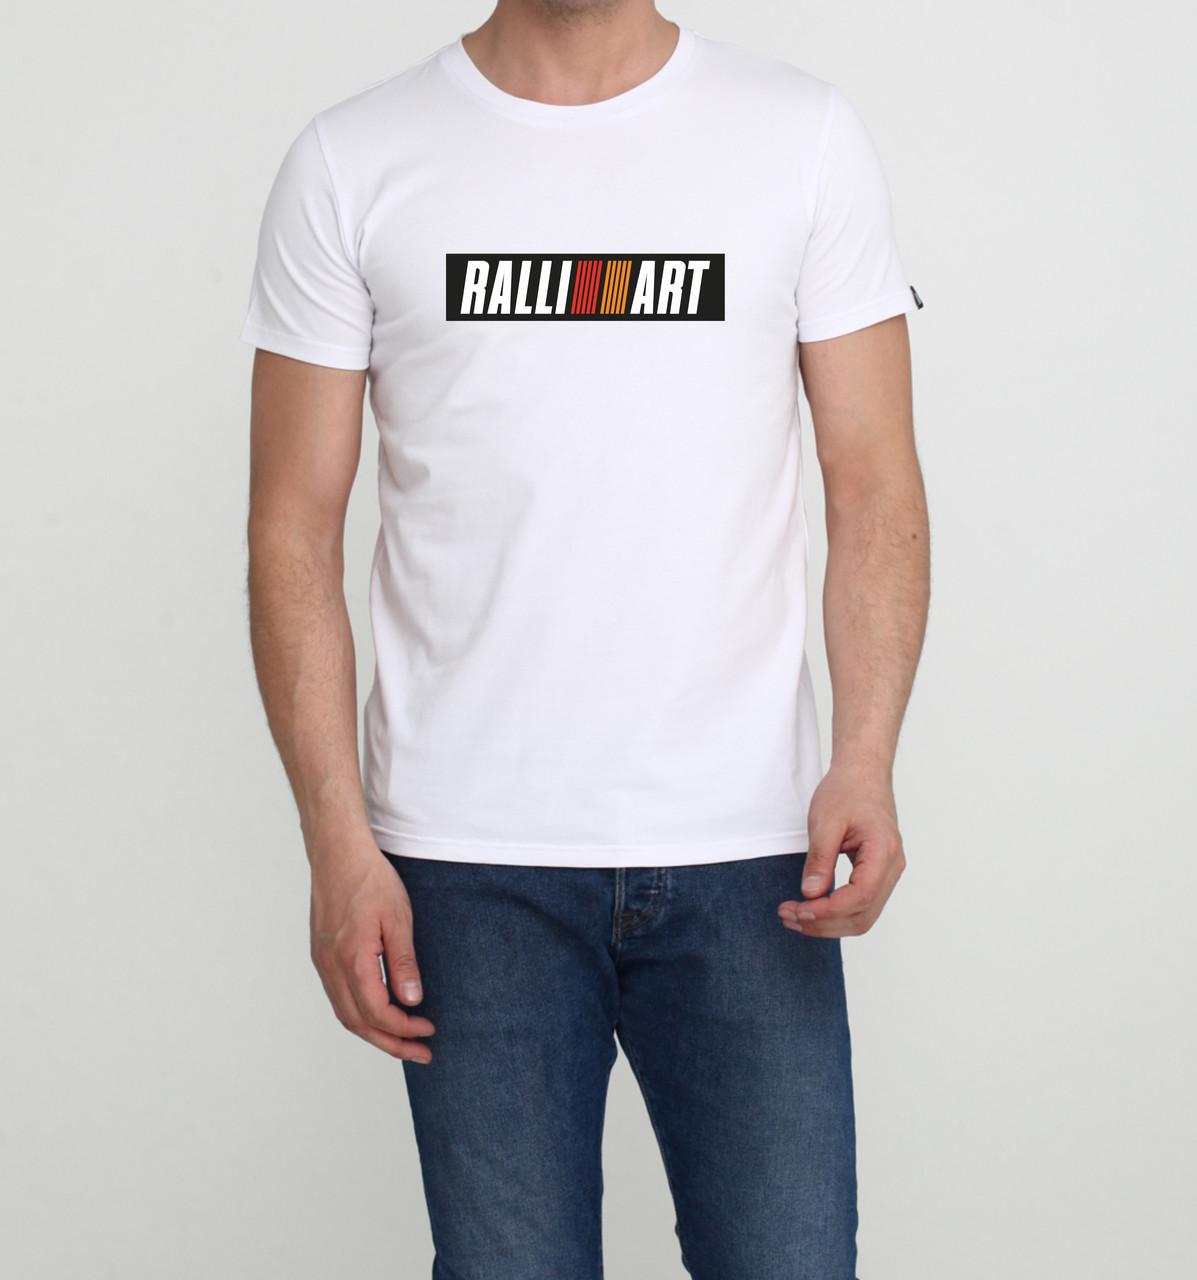 Футболка Mitsubishi RalliArt біла